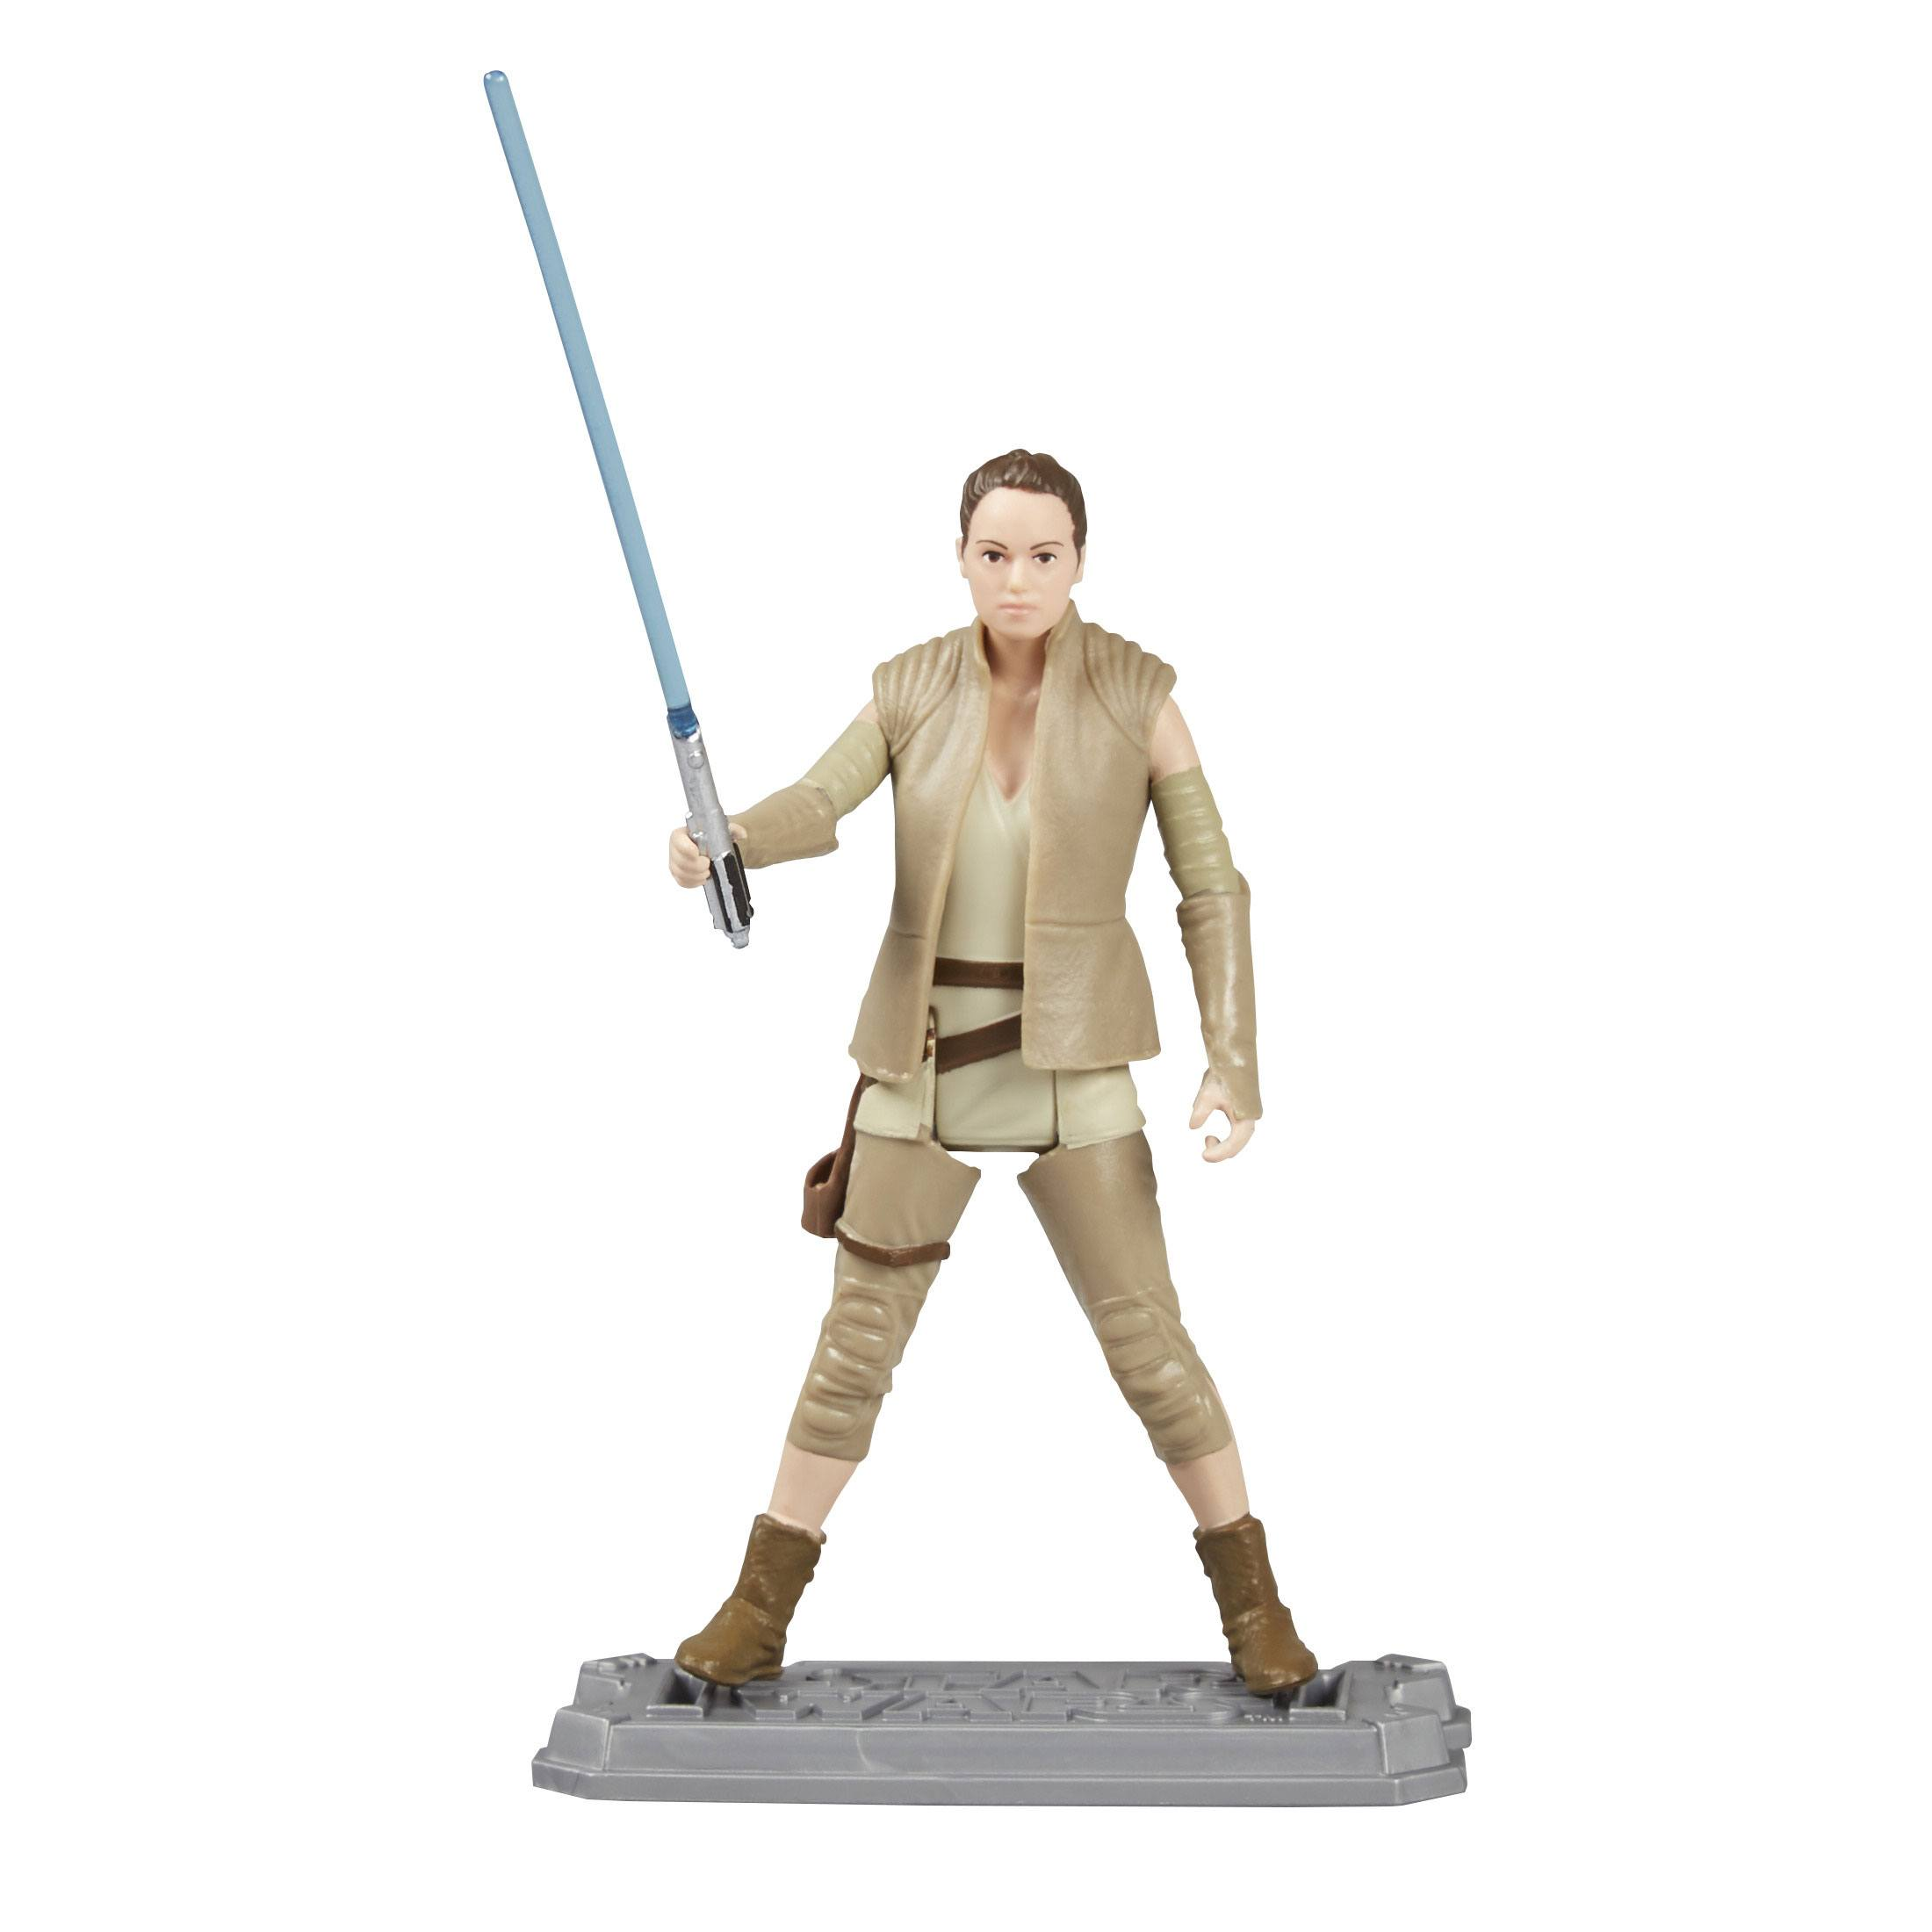 Figurine star wars lot de 8 ère de la force exclusive Hasbro Disney